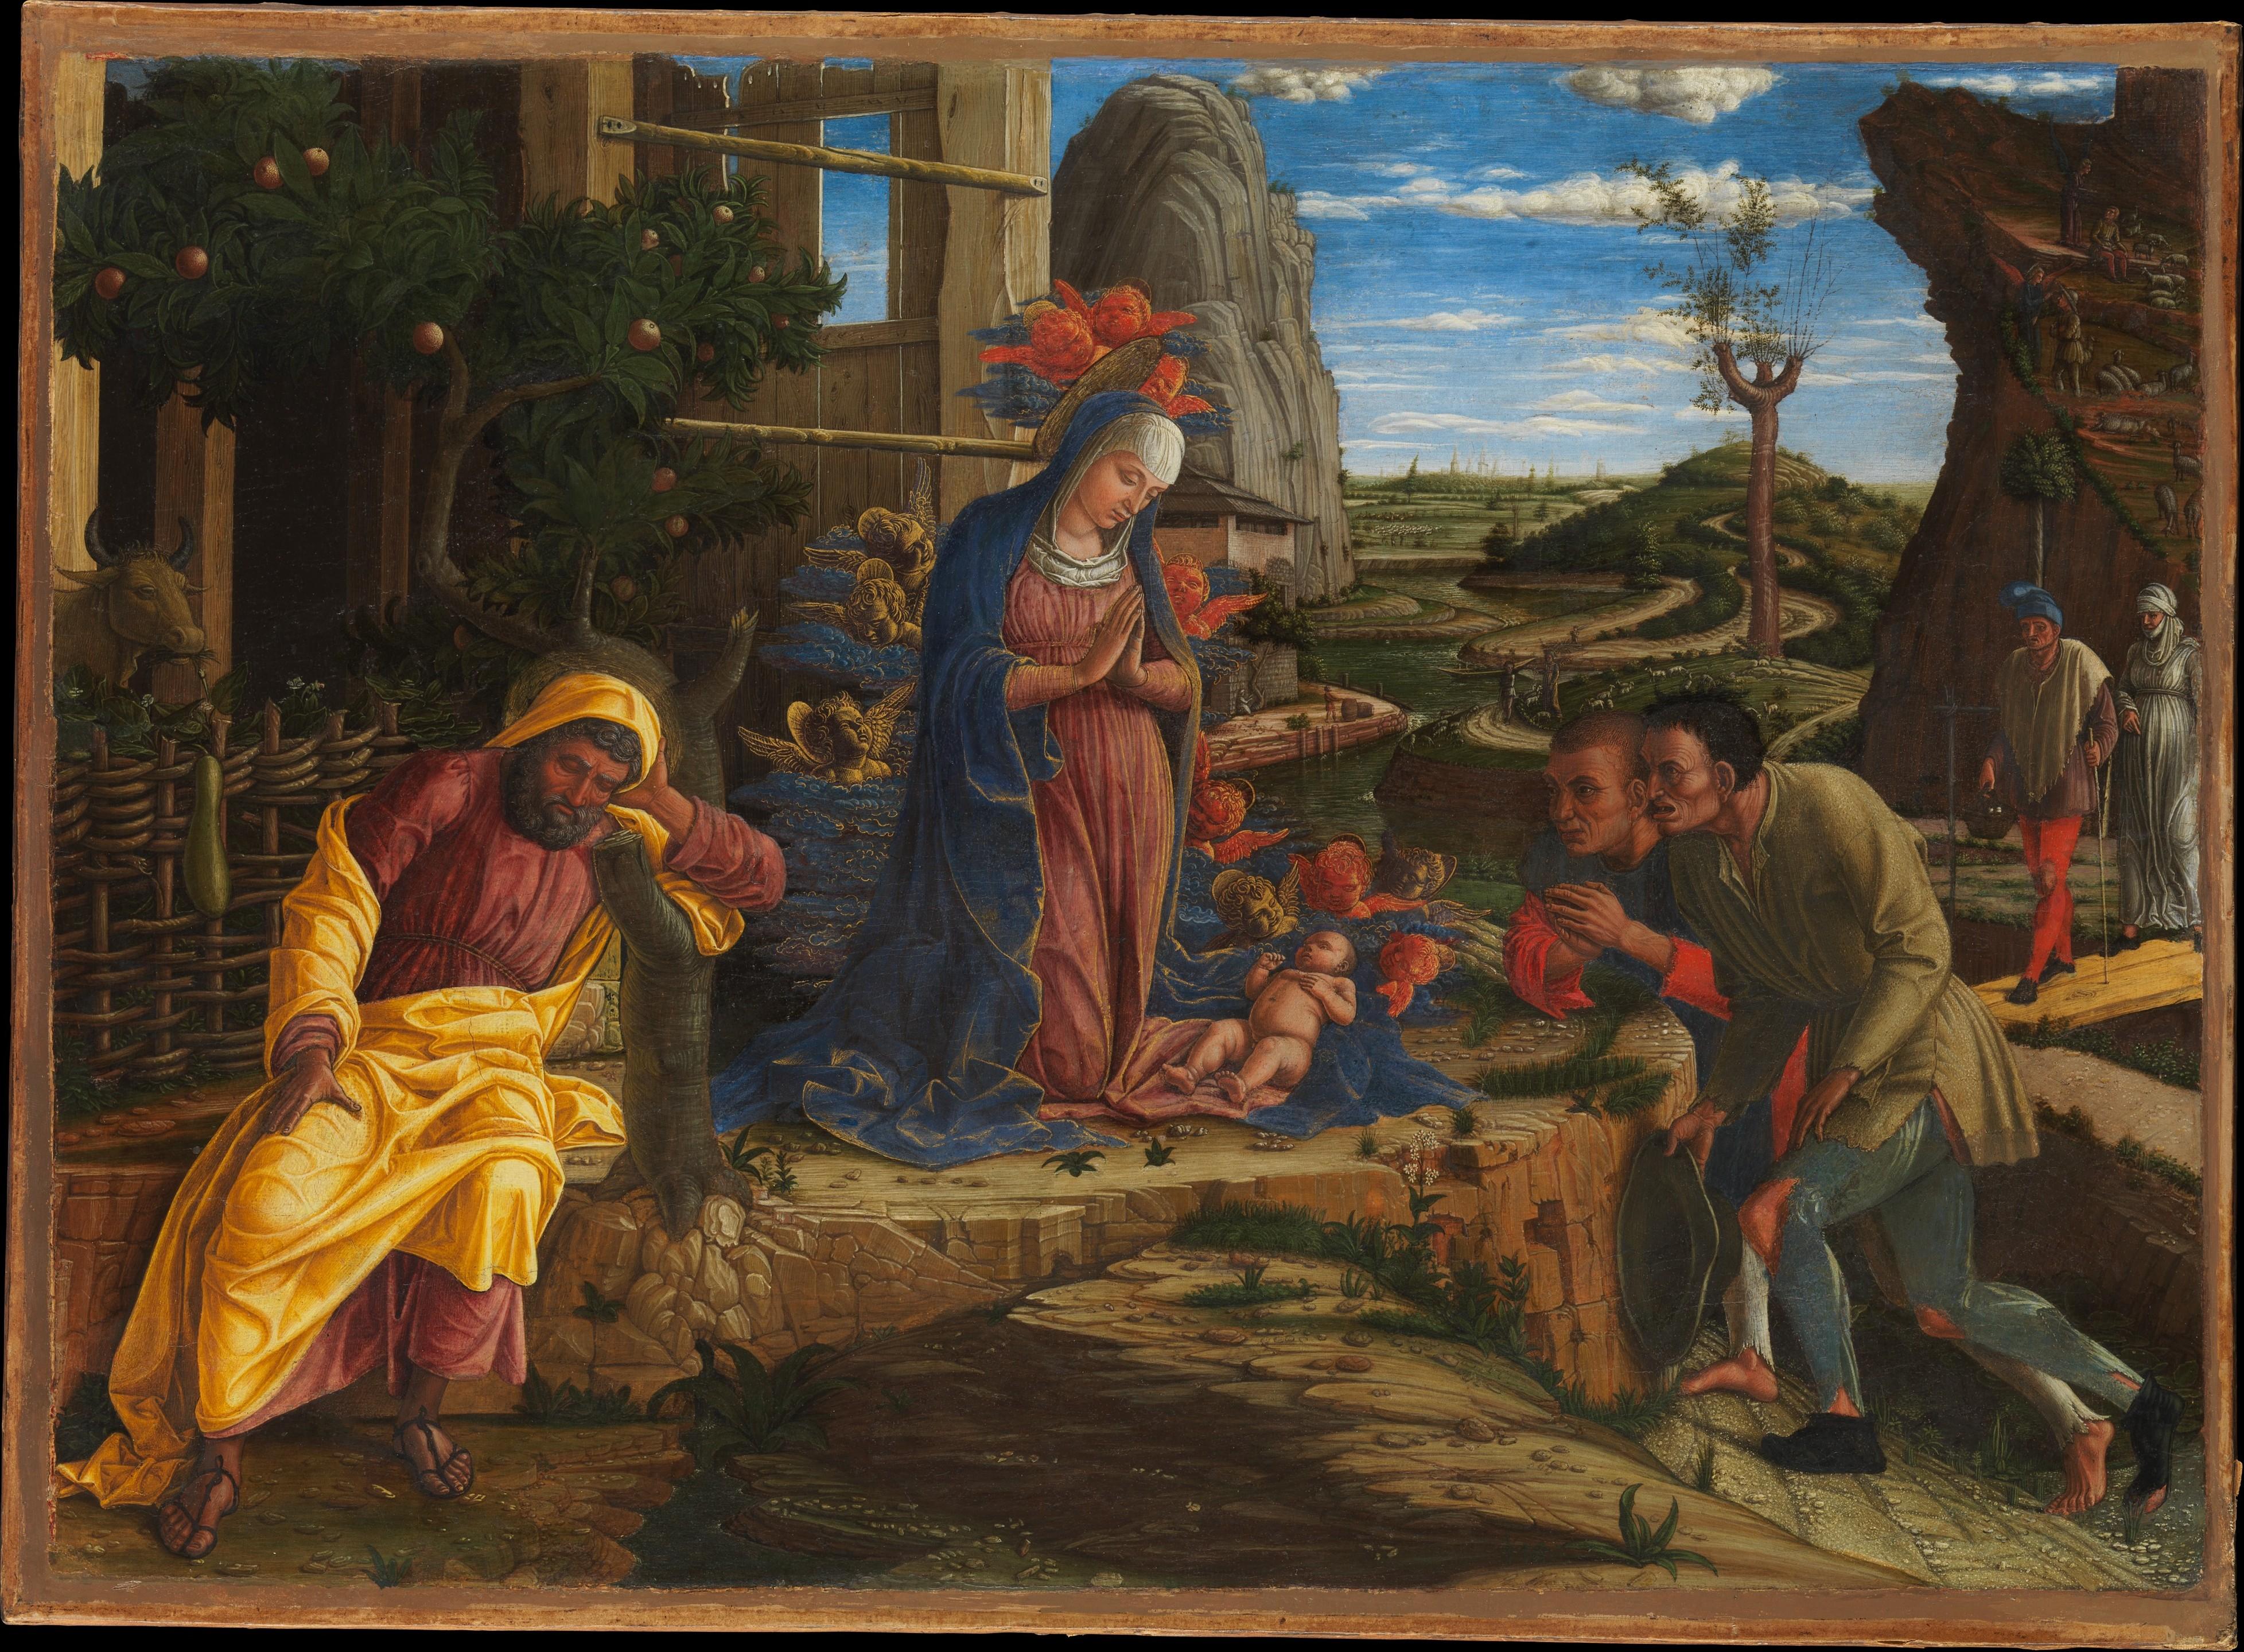 Mantagna's Adoration of the Shephards